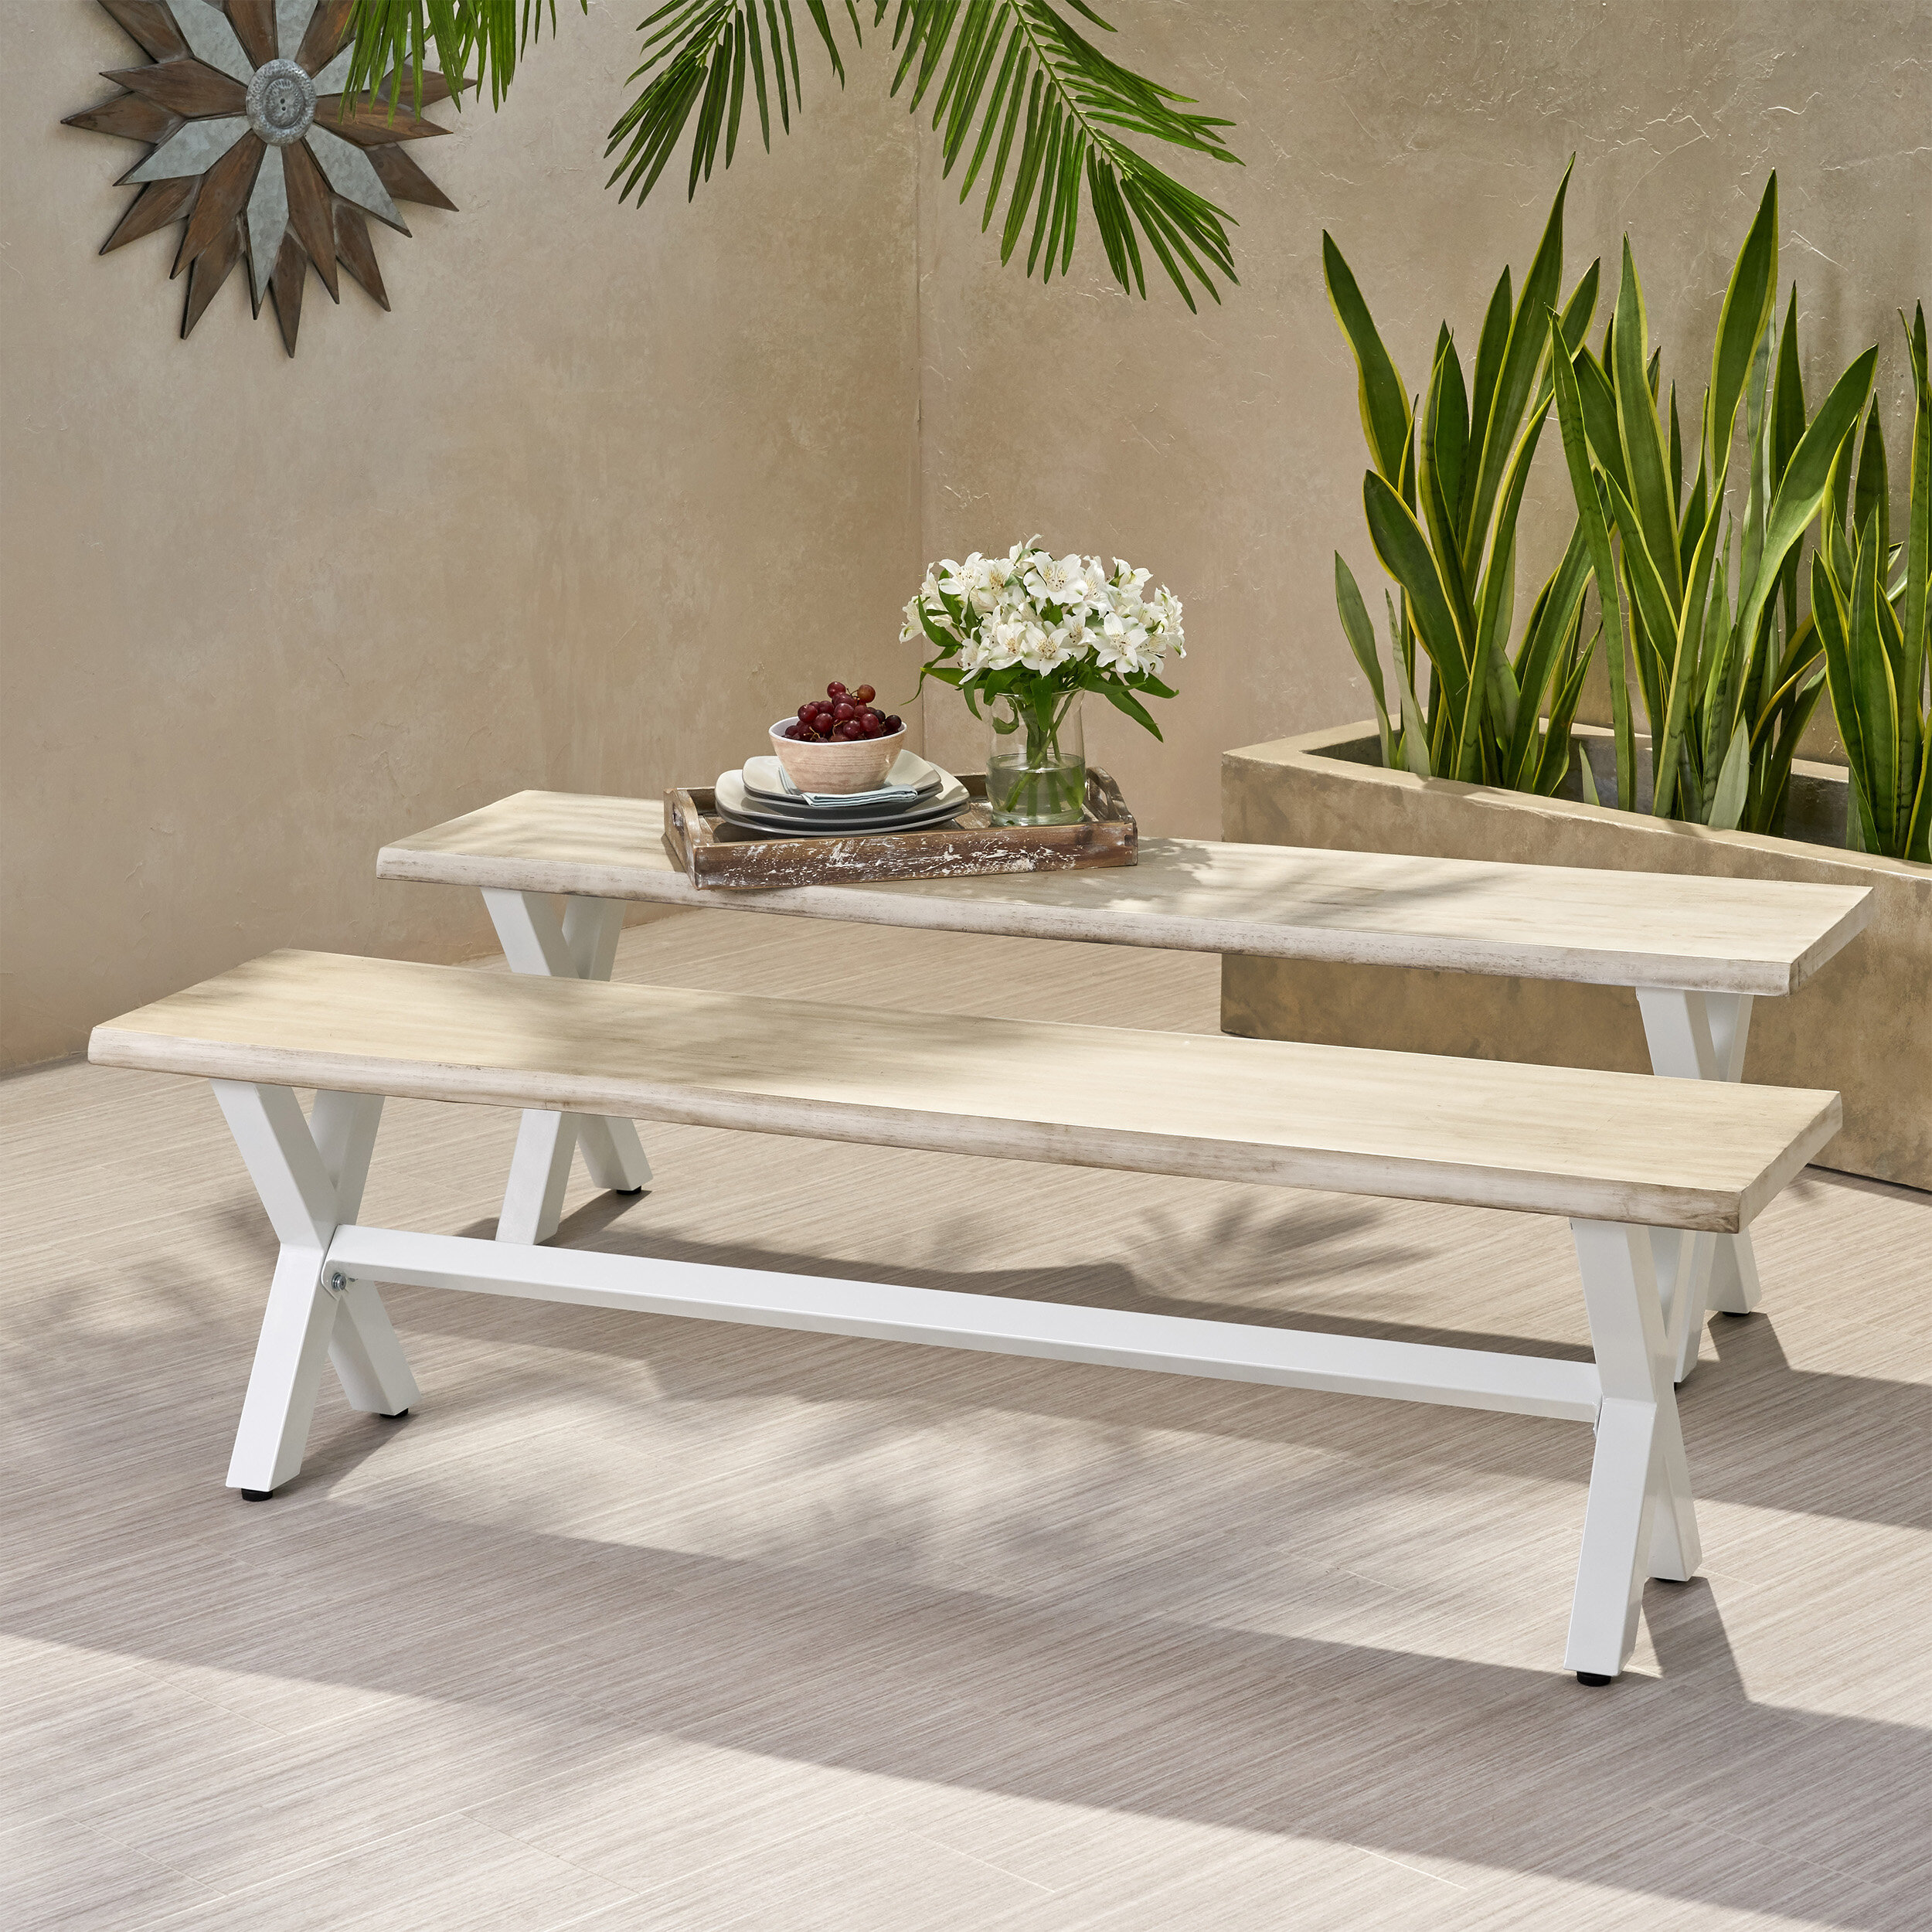 Terrific Galyon Wooden And Iron Picnic Bench Evergreenethics Interior Chair Design Evergreenethicsorg